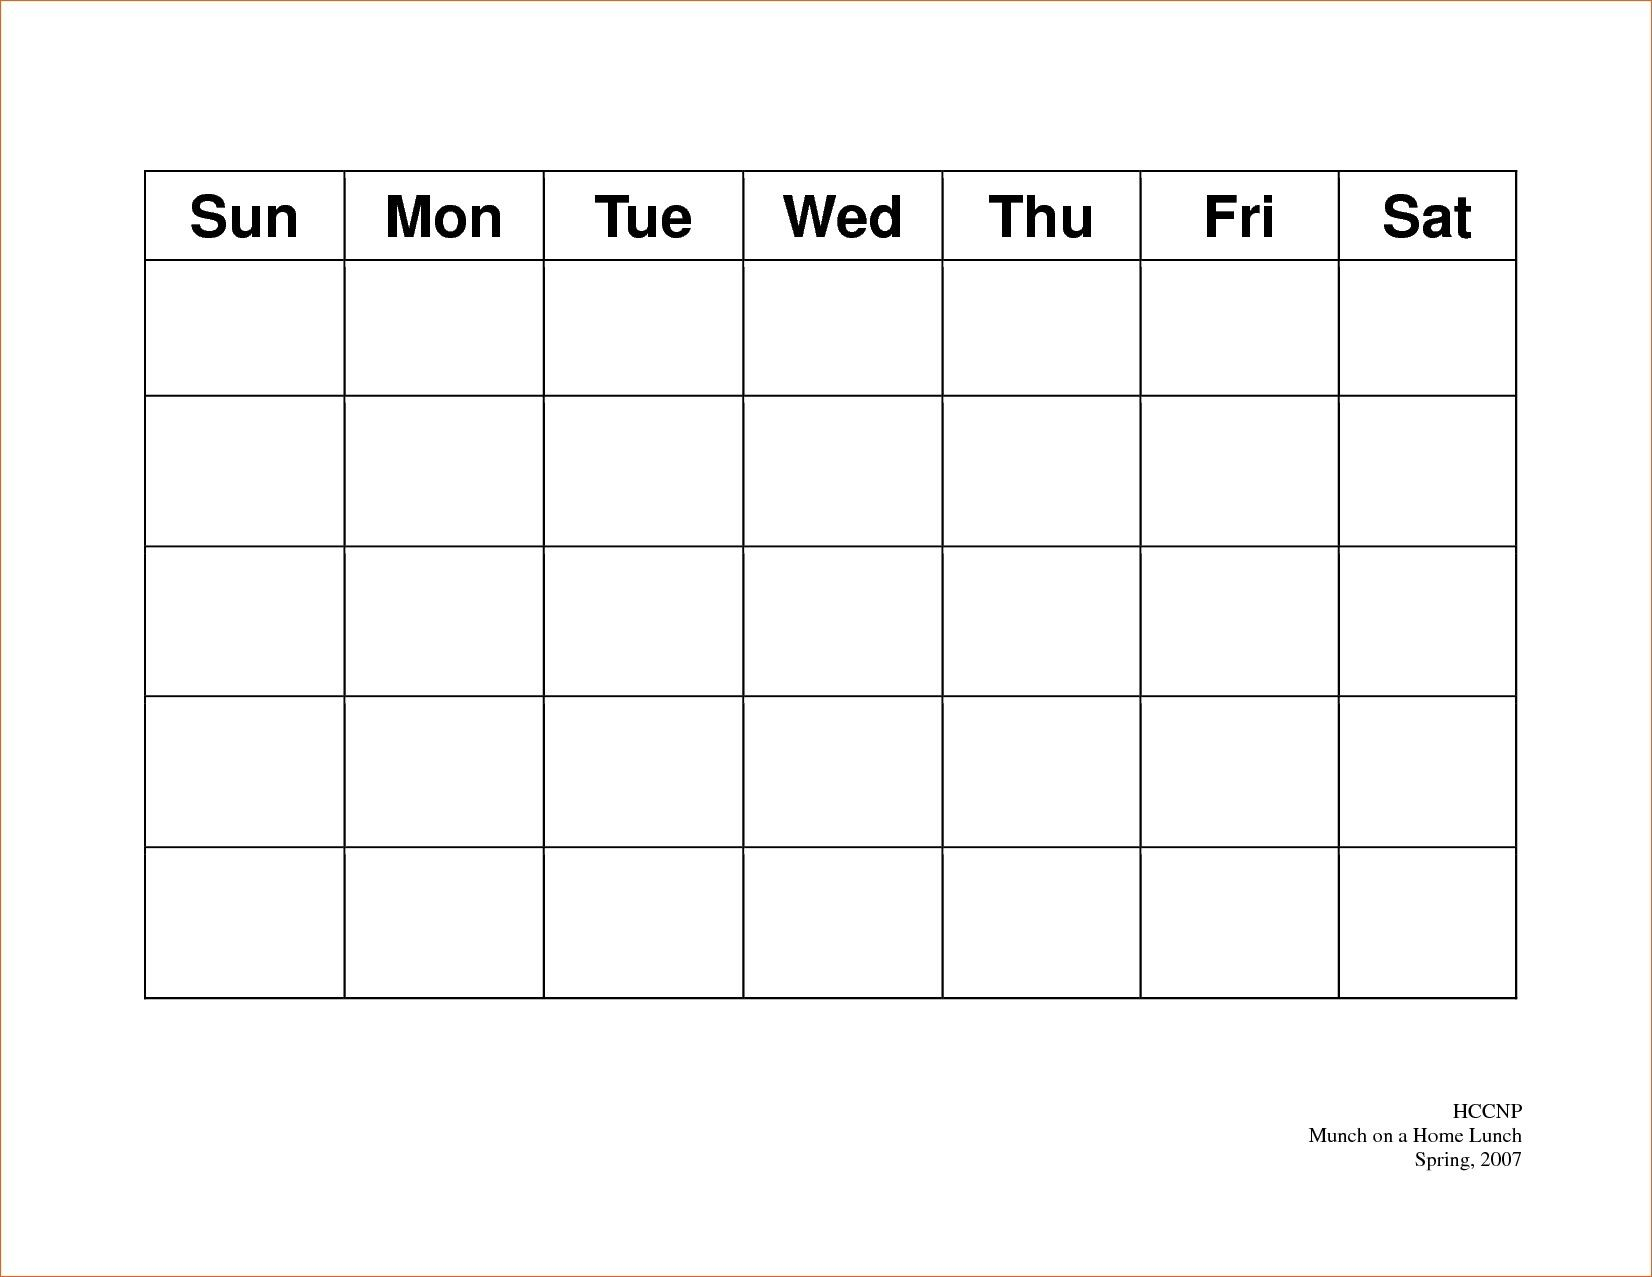 Calendar 5 Day Weekly Calendar Template On 5 Week Calendar Template with regard to 5 Day Weekly Calendar Template